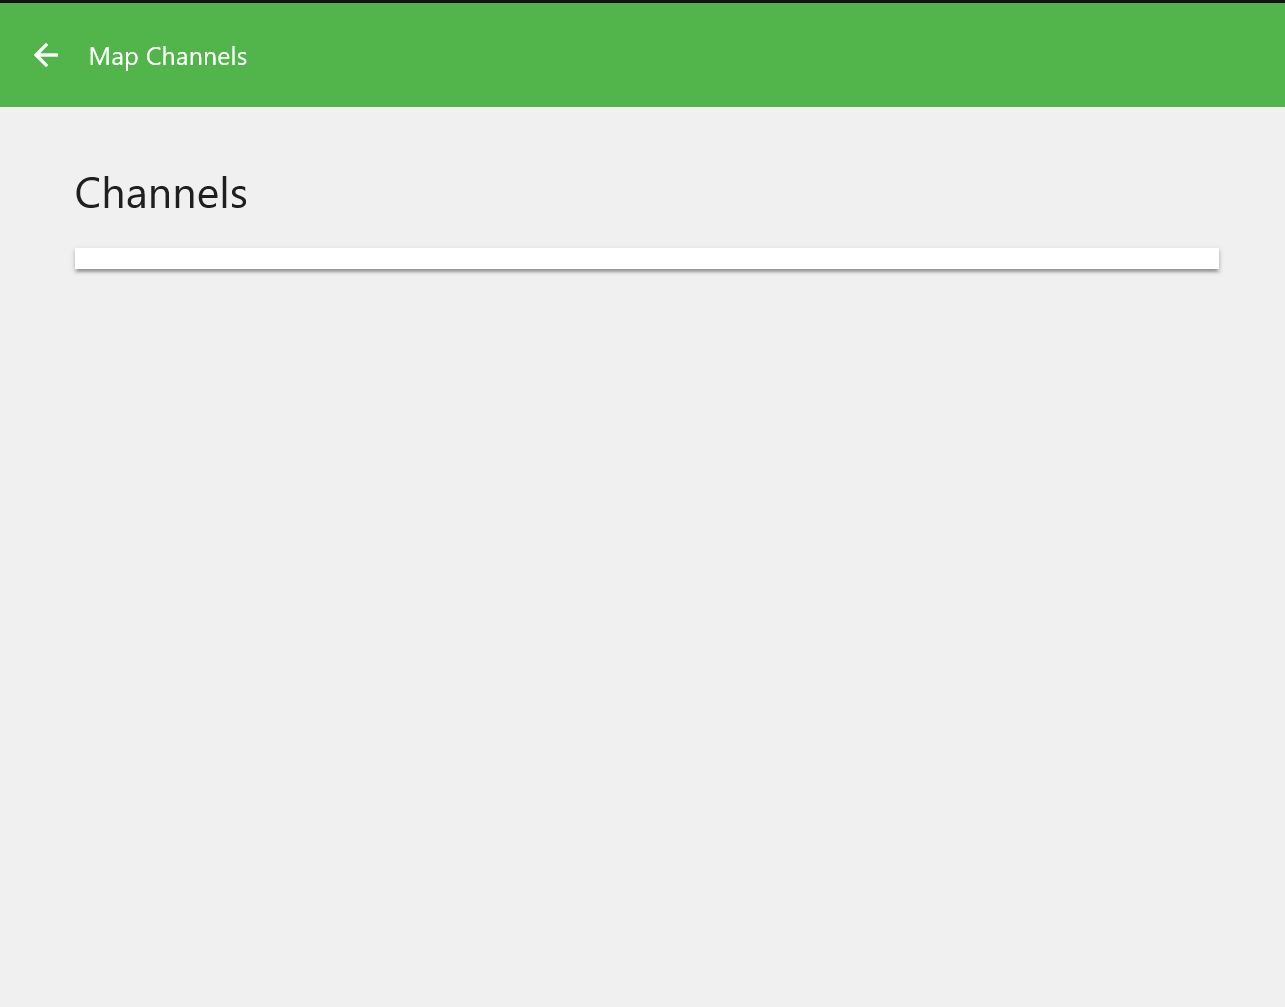 5a24ac564f6ac_Channels.png